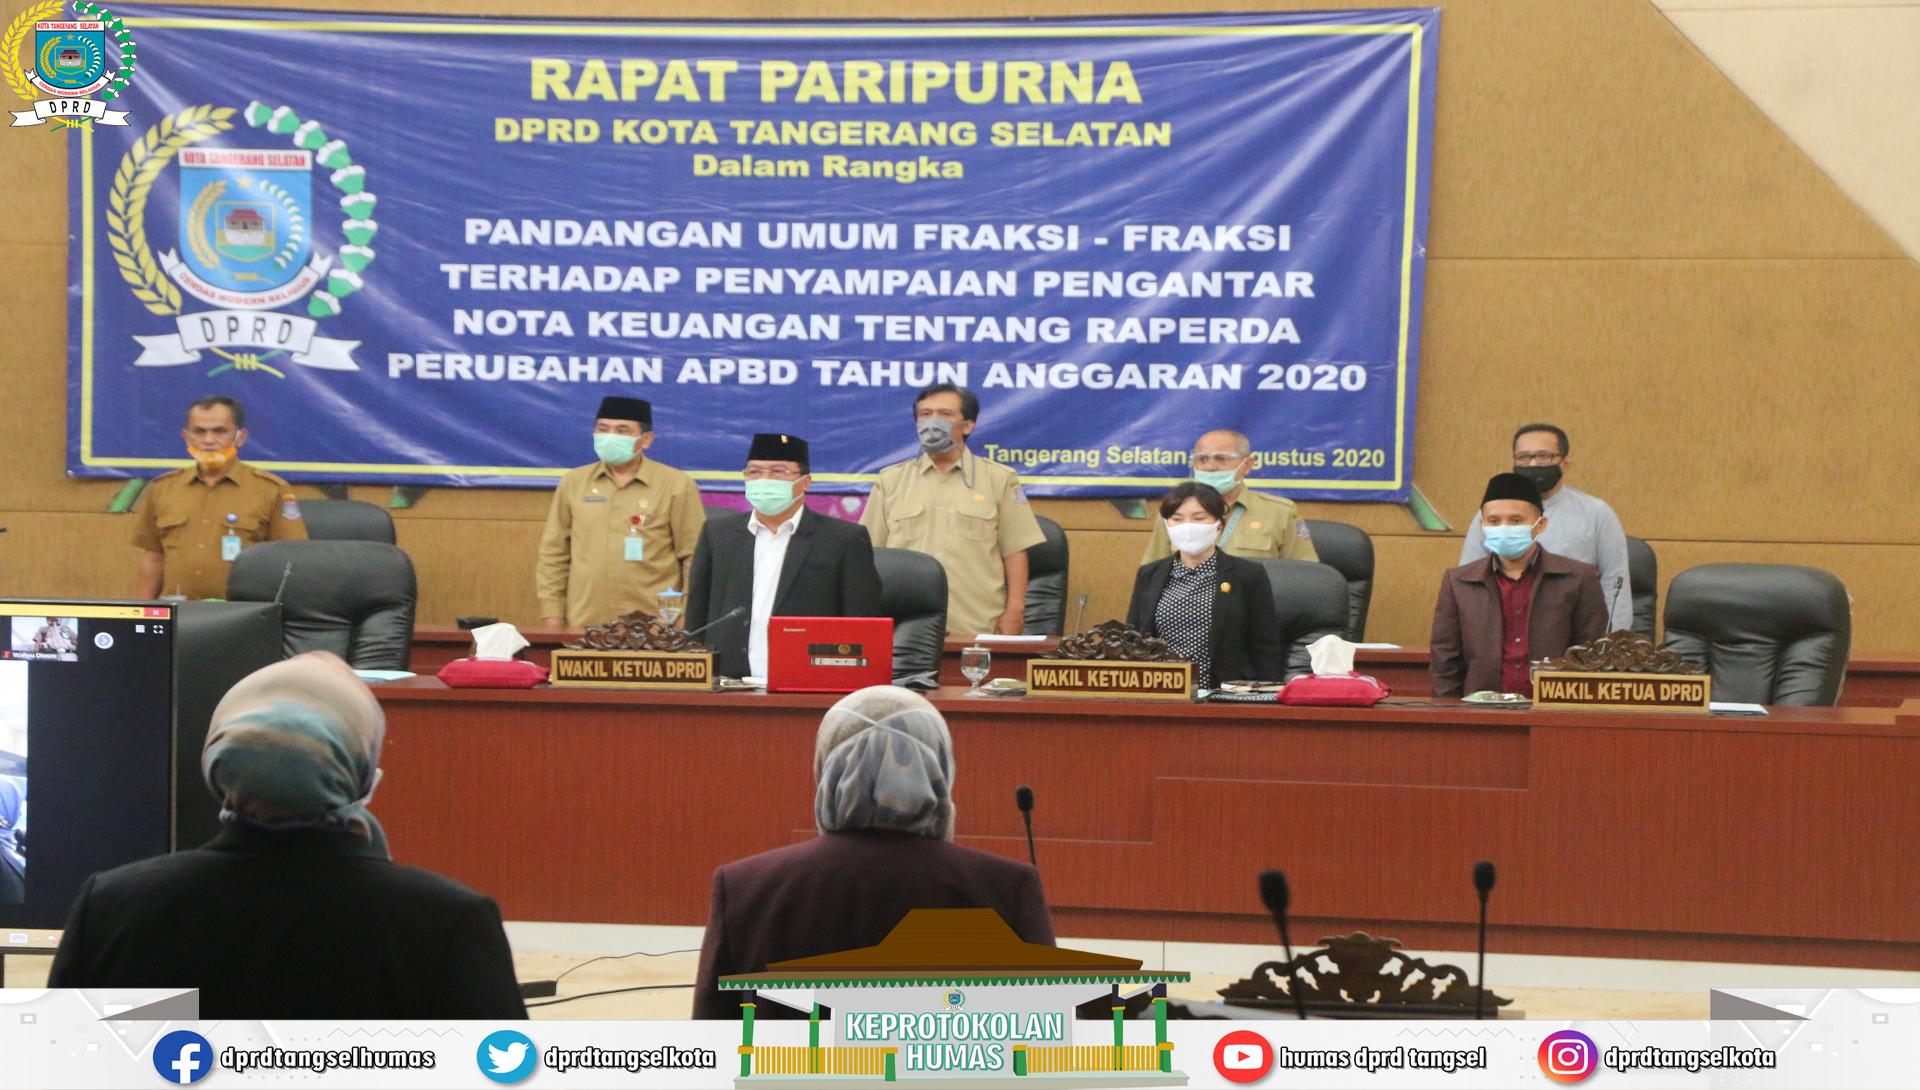 Pandum Fraksi thd Penyampaian Nota Keuangan Raperda Perubahan APBD